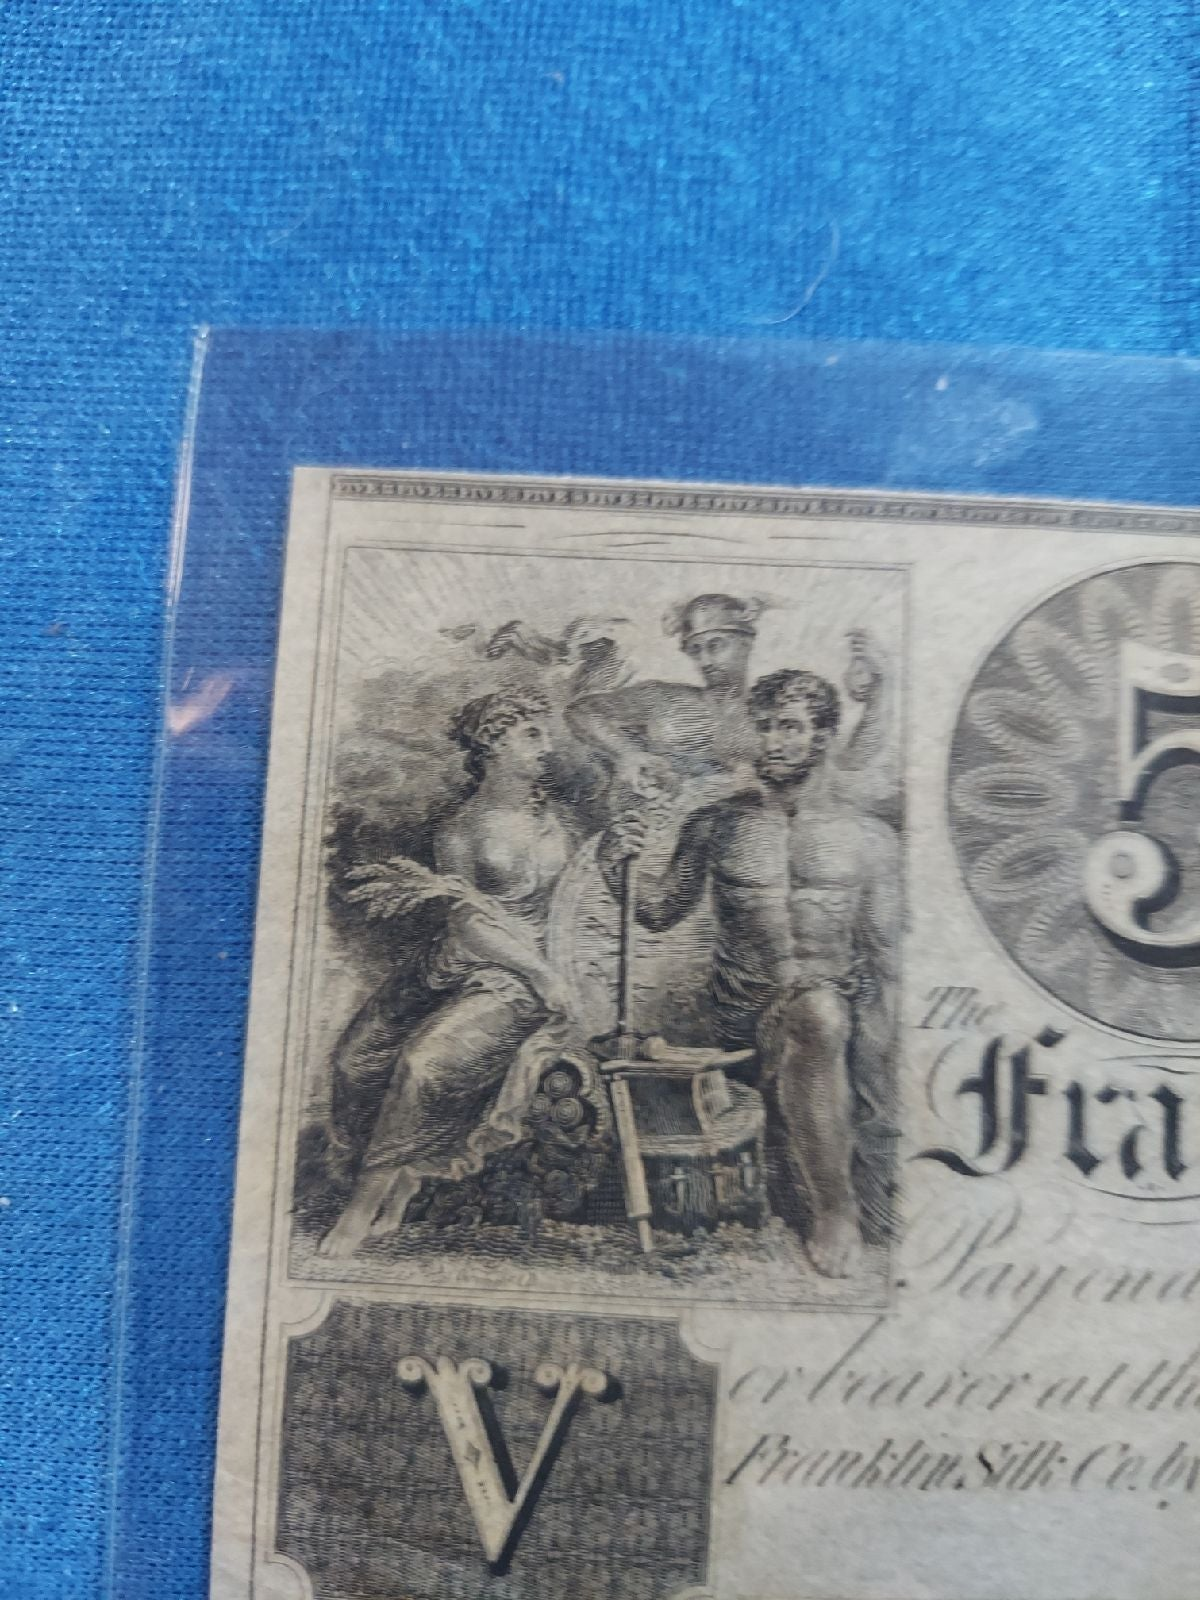 RARE Paper money, $5 currency 1833-38 UN